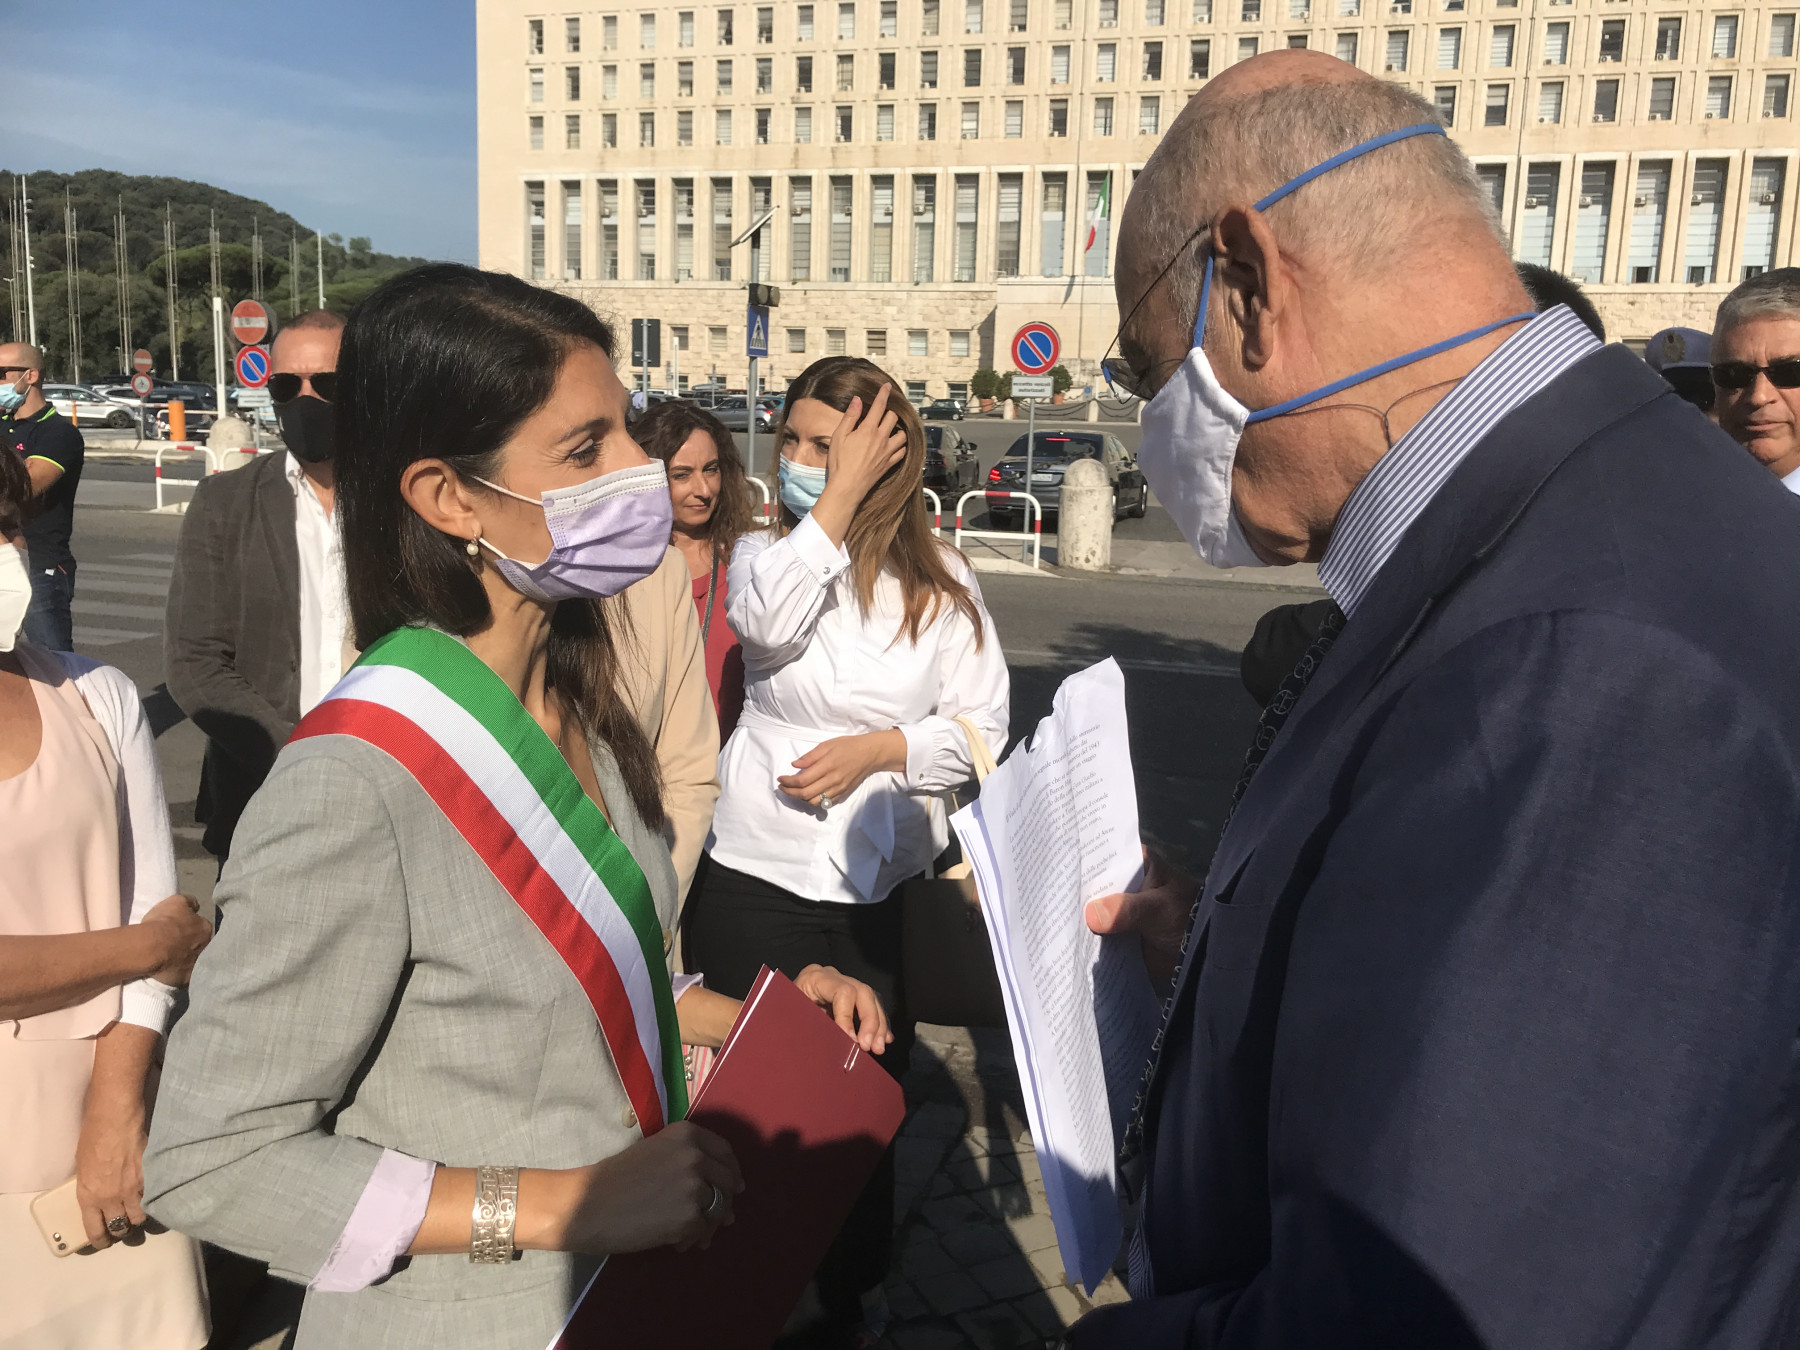 The president of Gariwo Gabriele Nissim with the Mayor of Rome Virginia Raggi